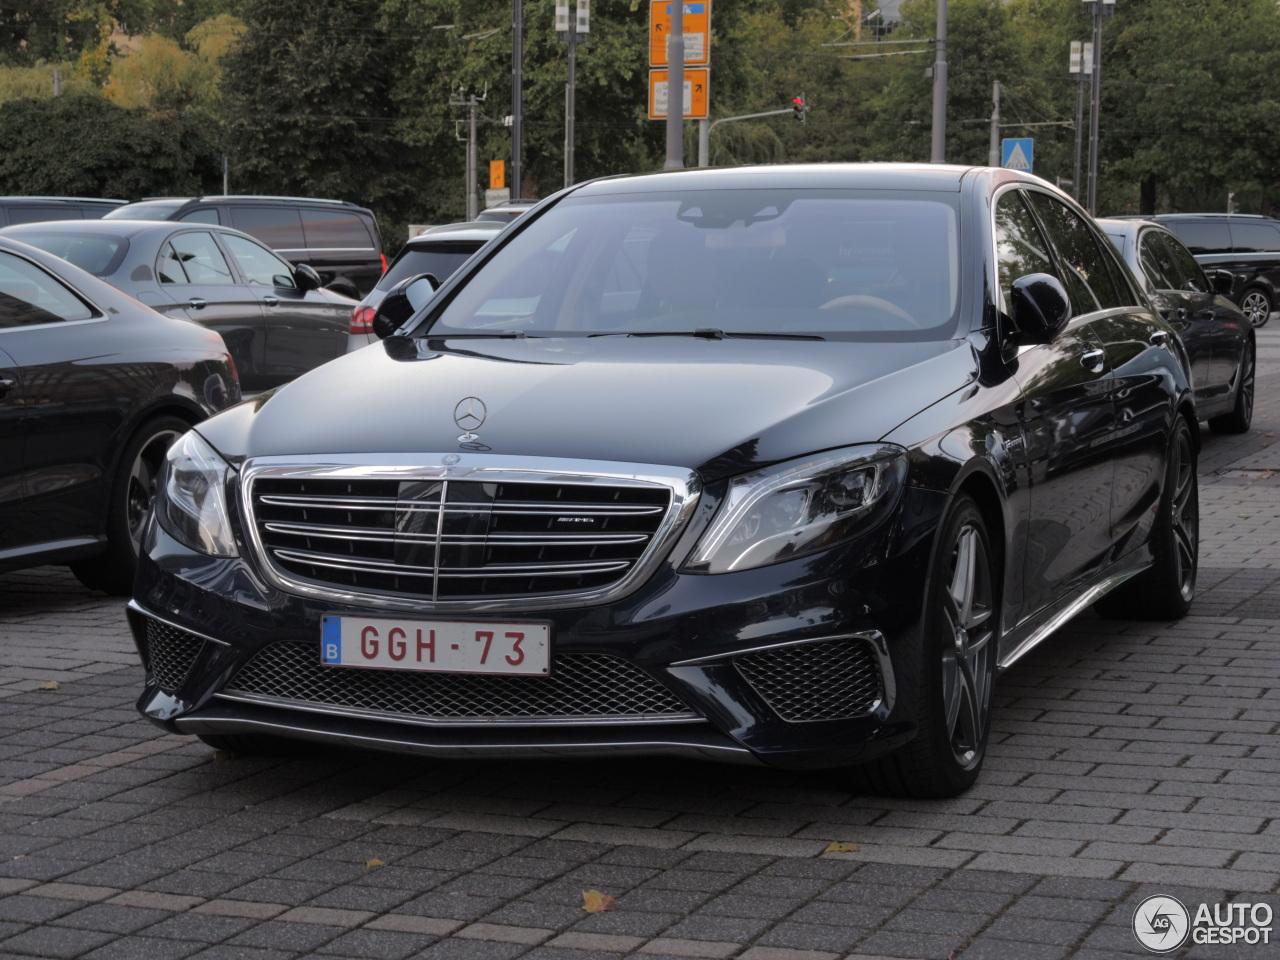 Mercedes benz s 65 amg v222 14 november 2017 autogespot for 2017 amg s 65 mercedes benz